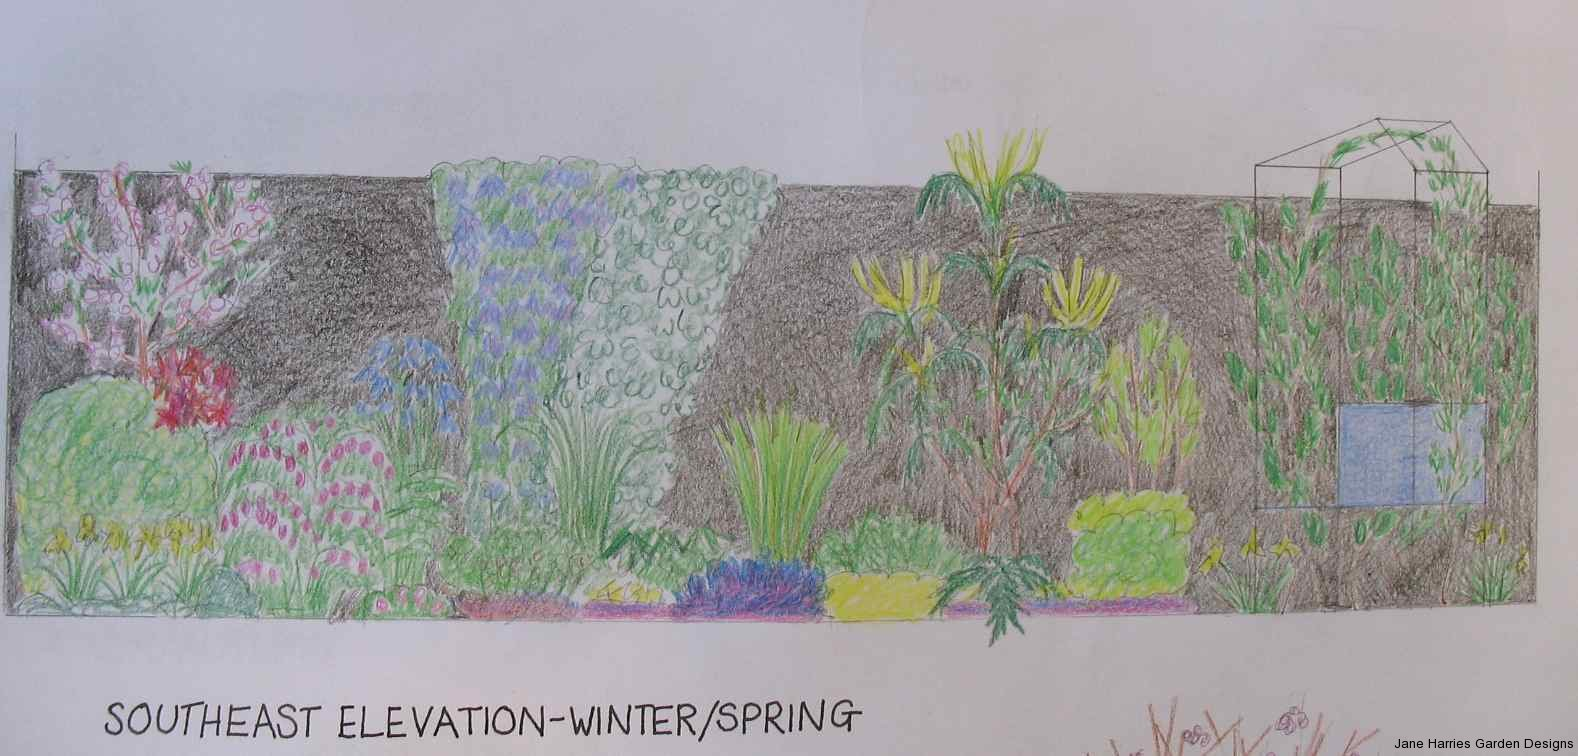 SW elevation winter/spring